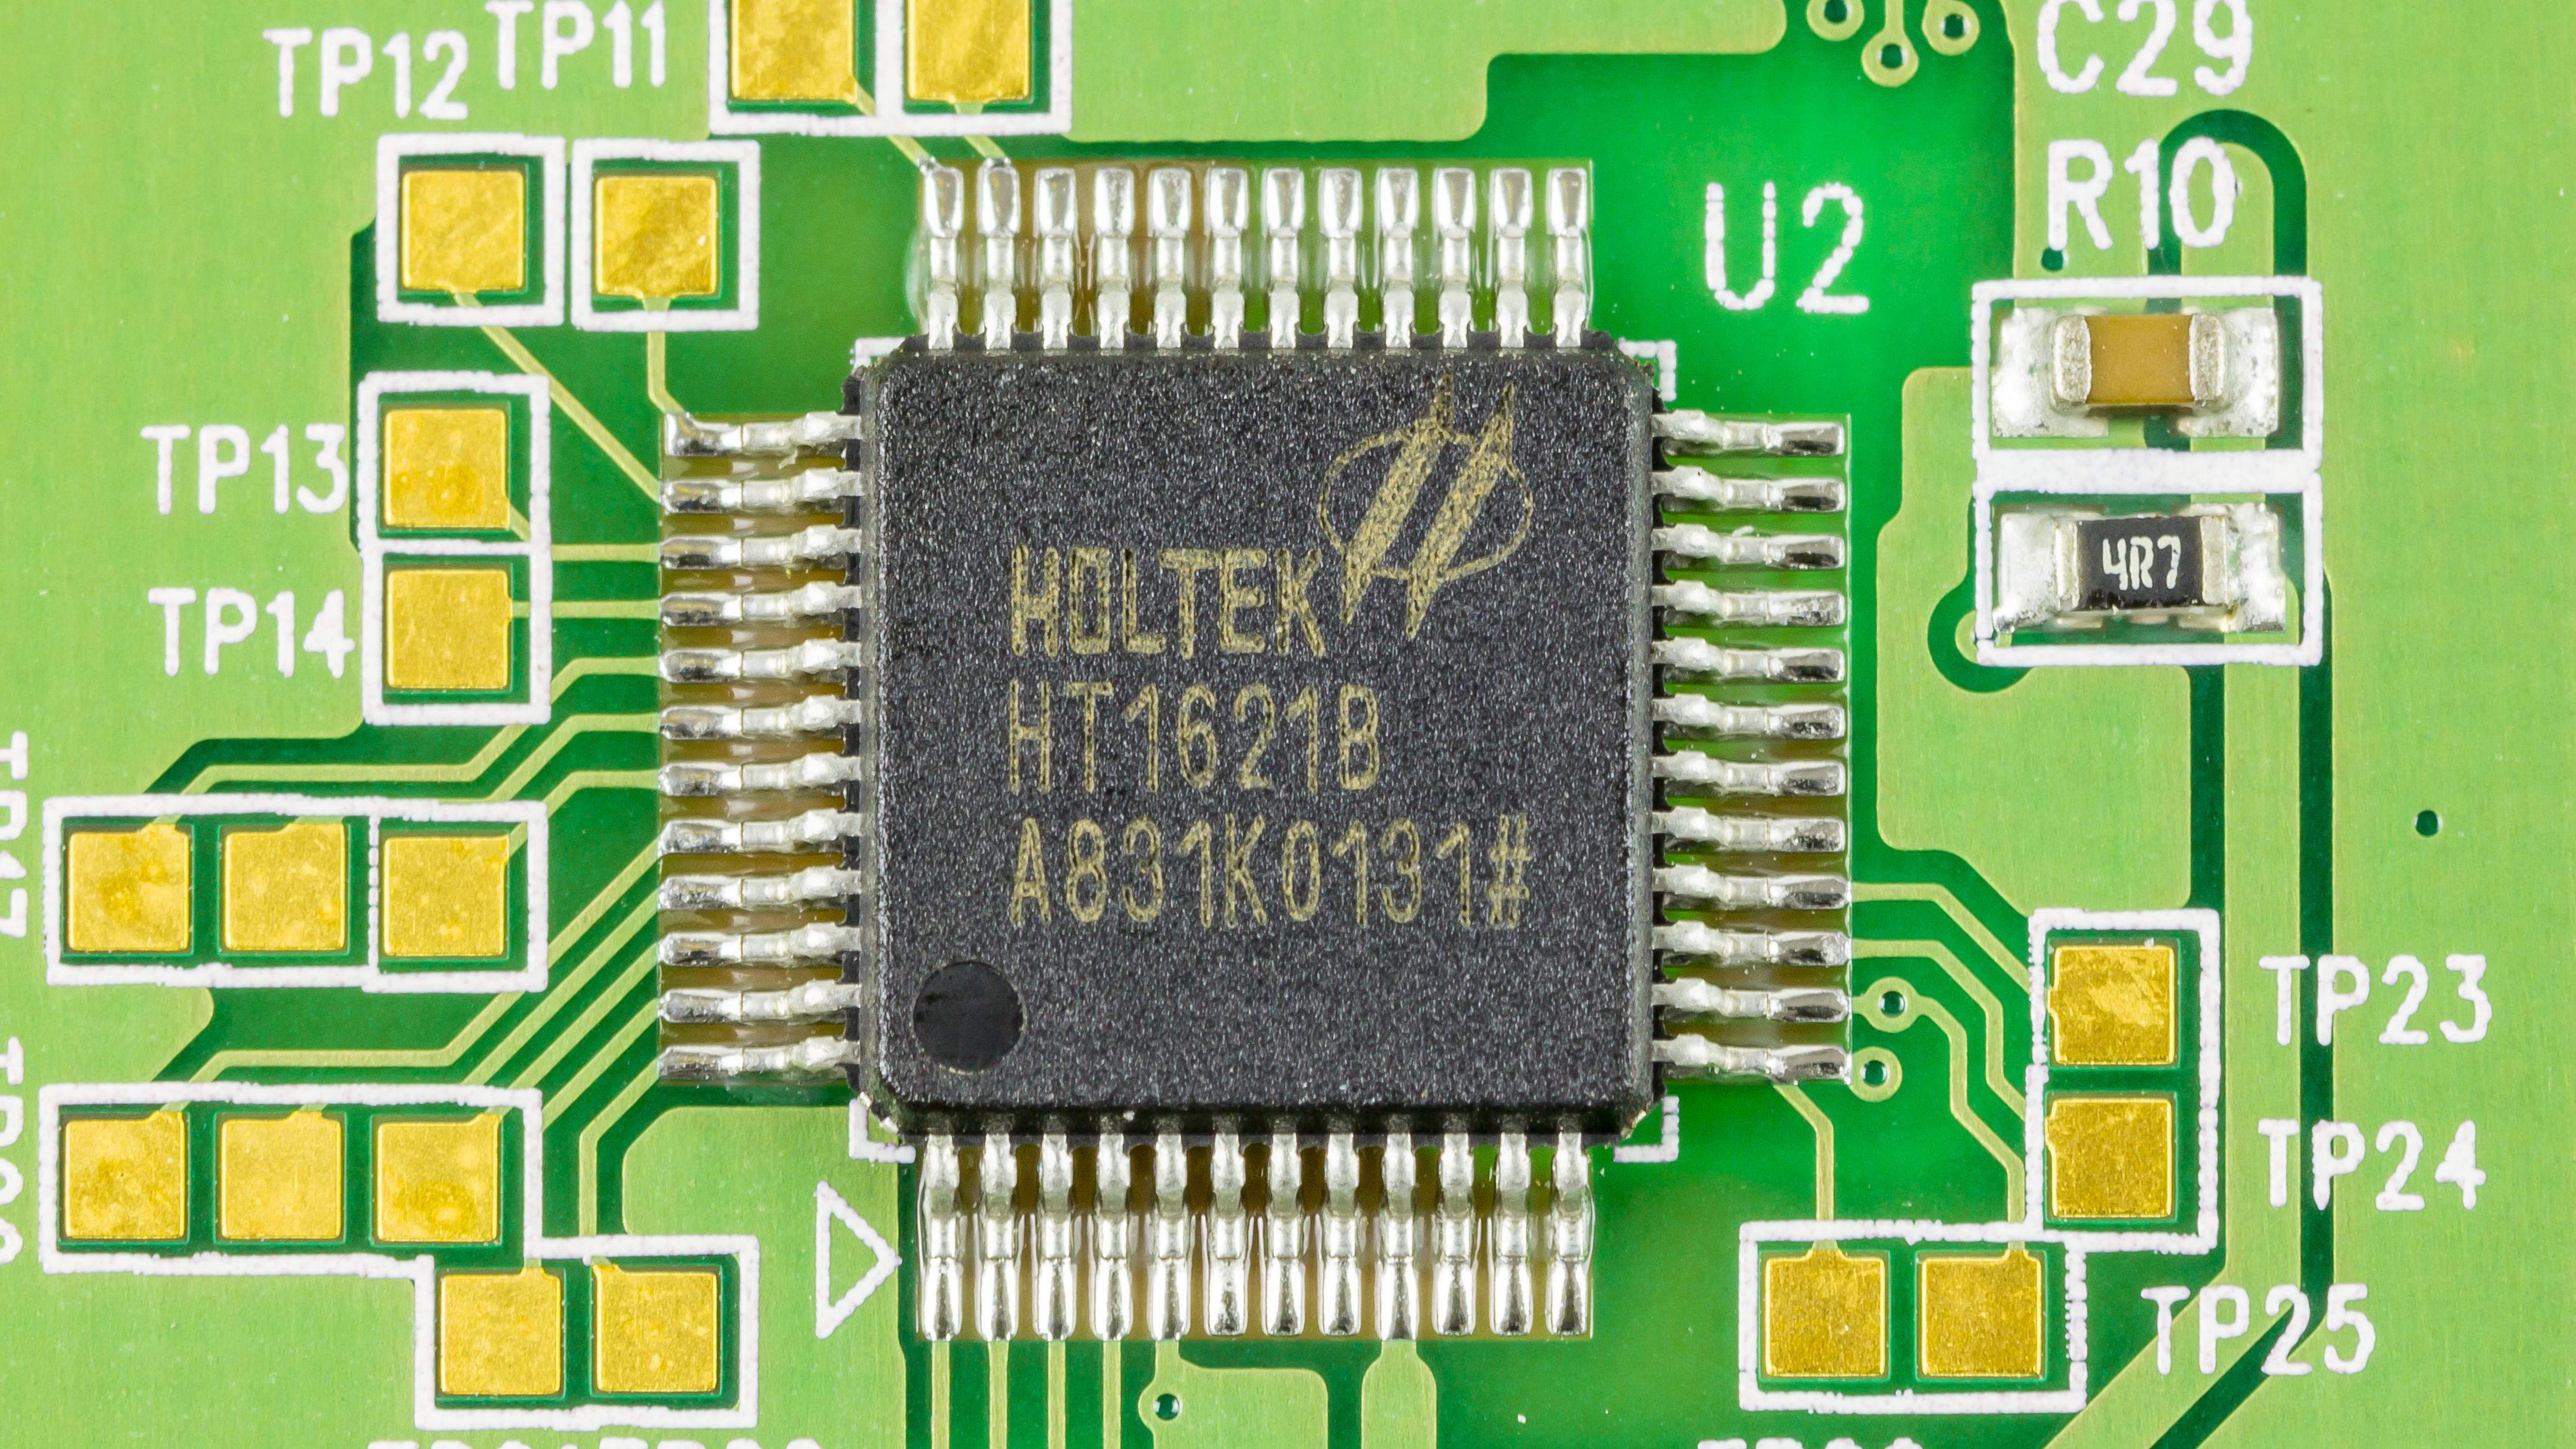 File:Tevion MD 85925 - Holtek HT1621B-4525.jpg